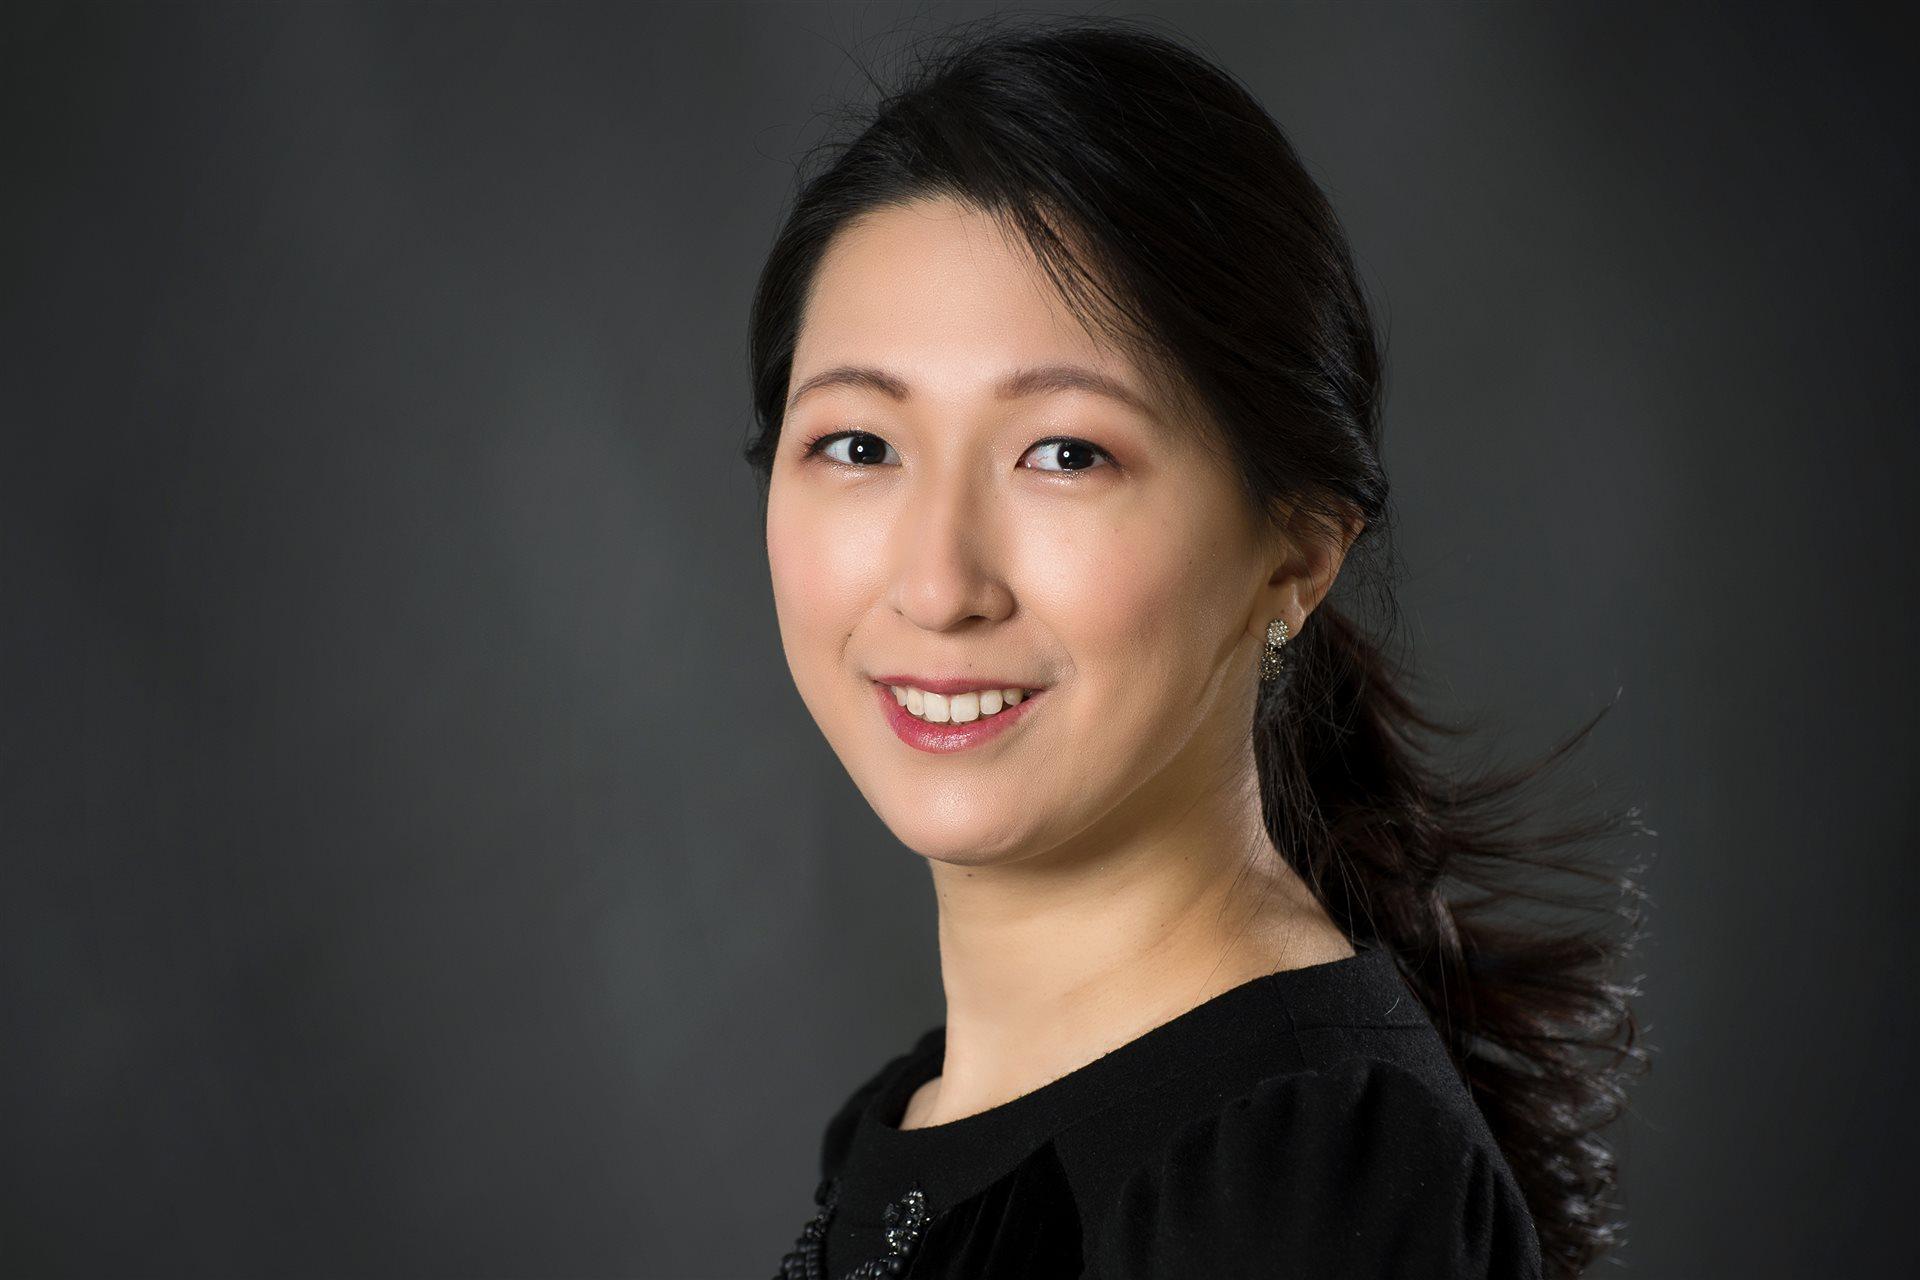 Suji Kim